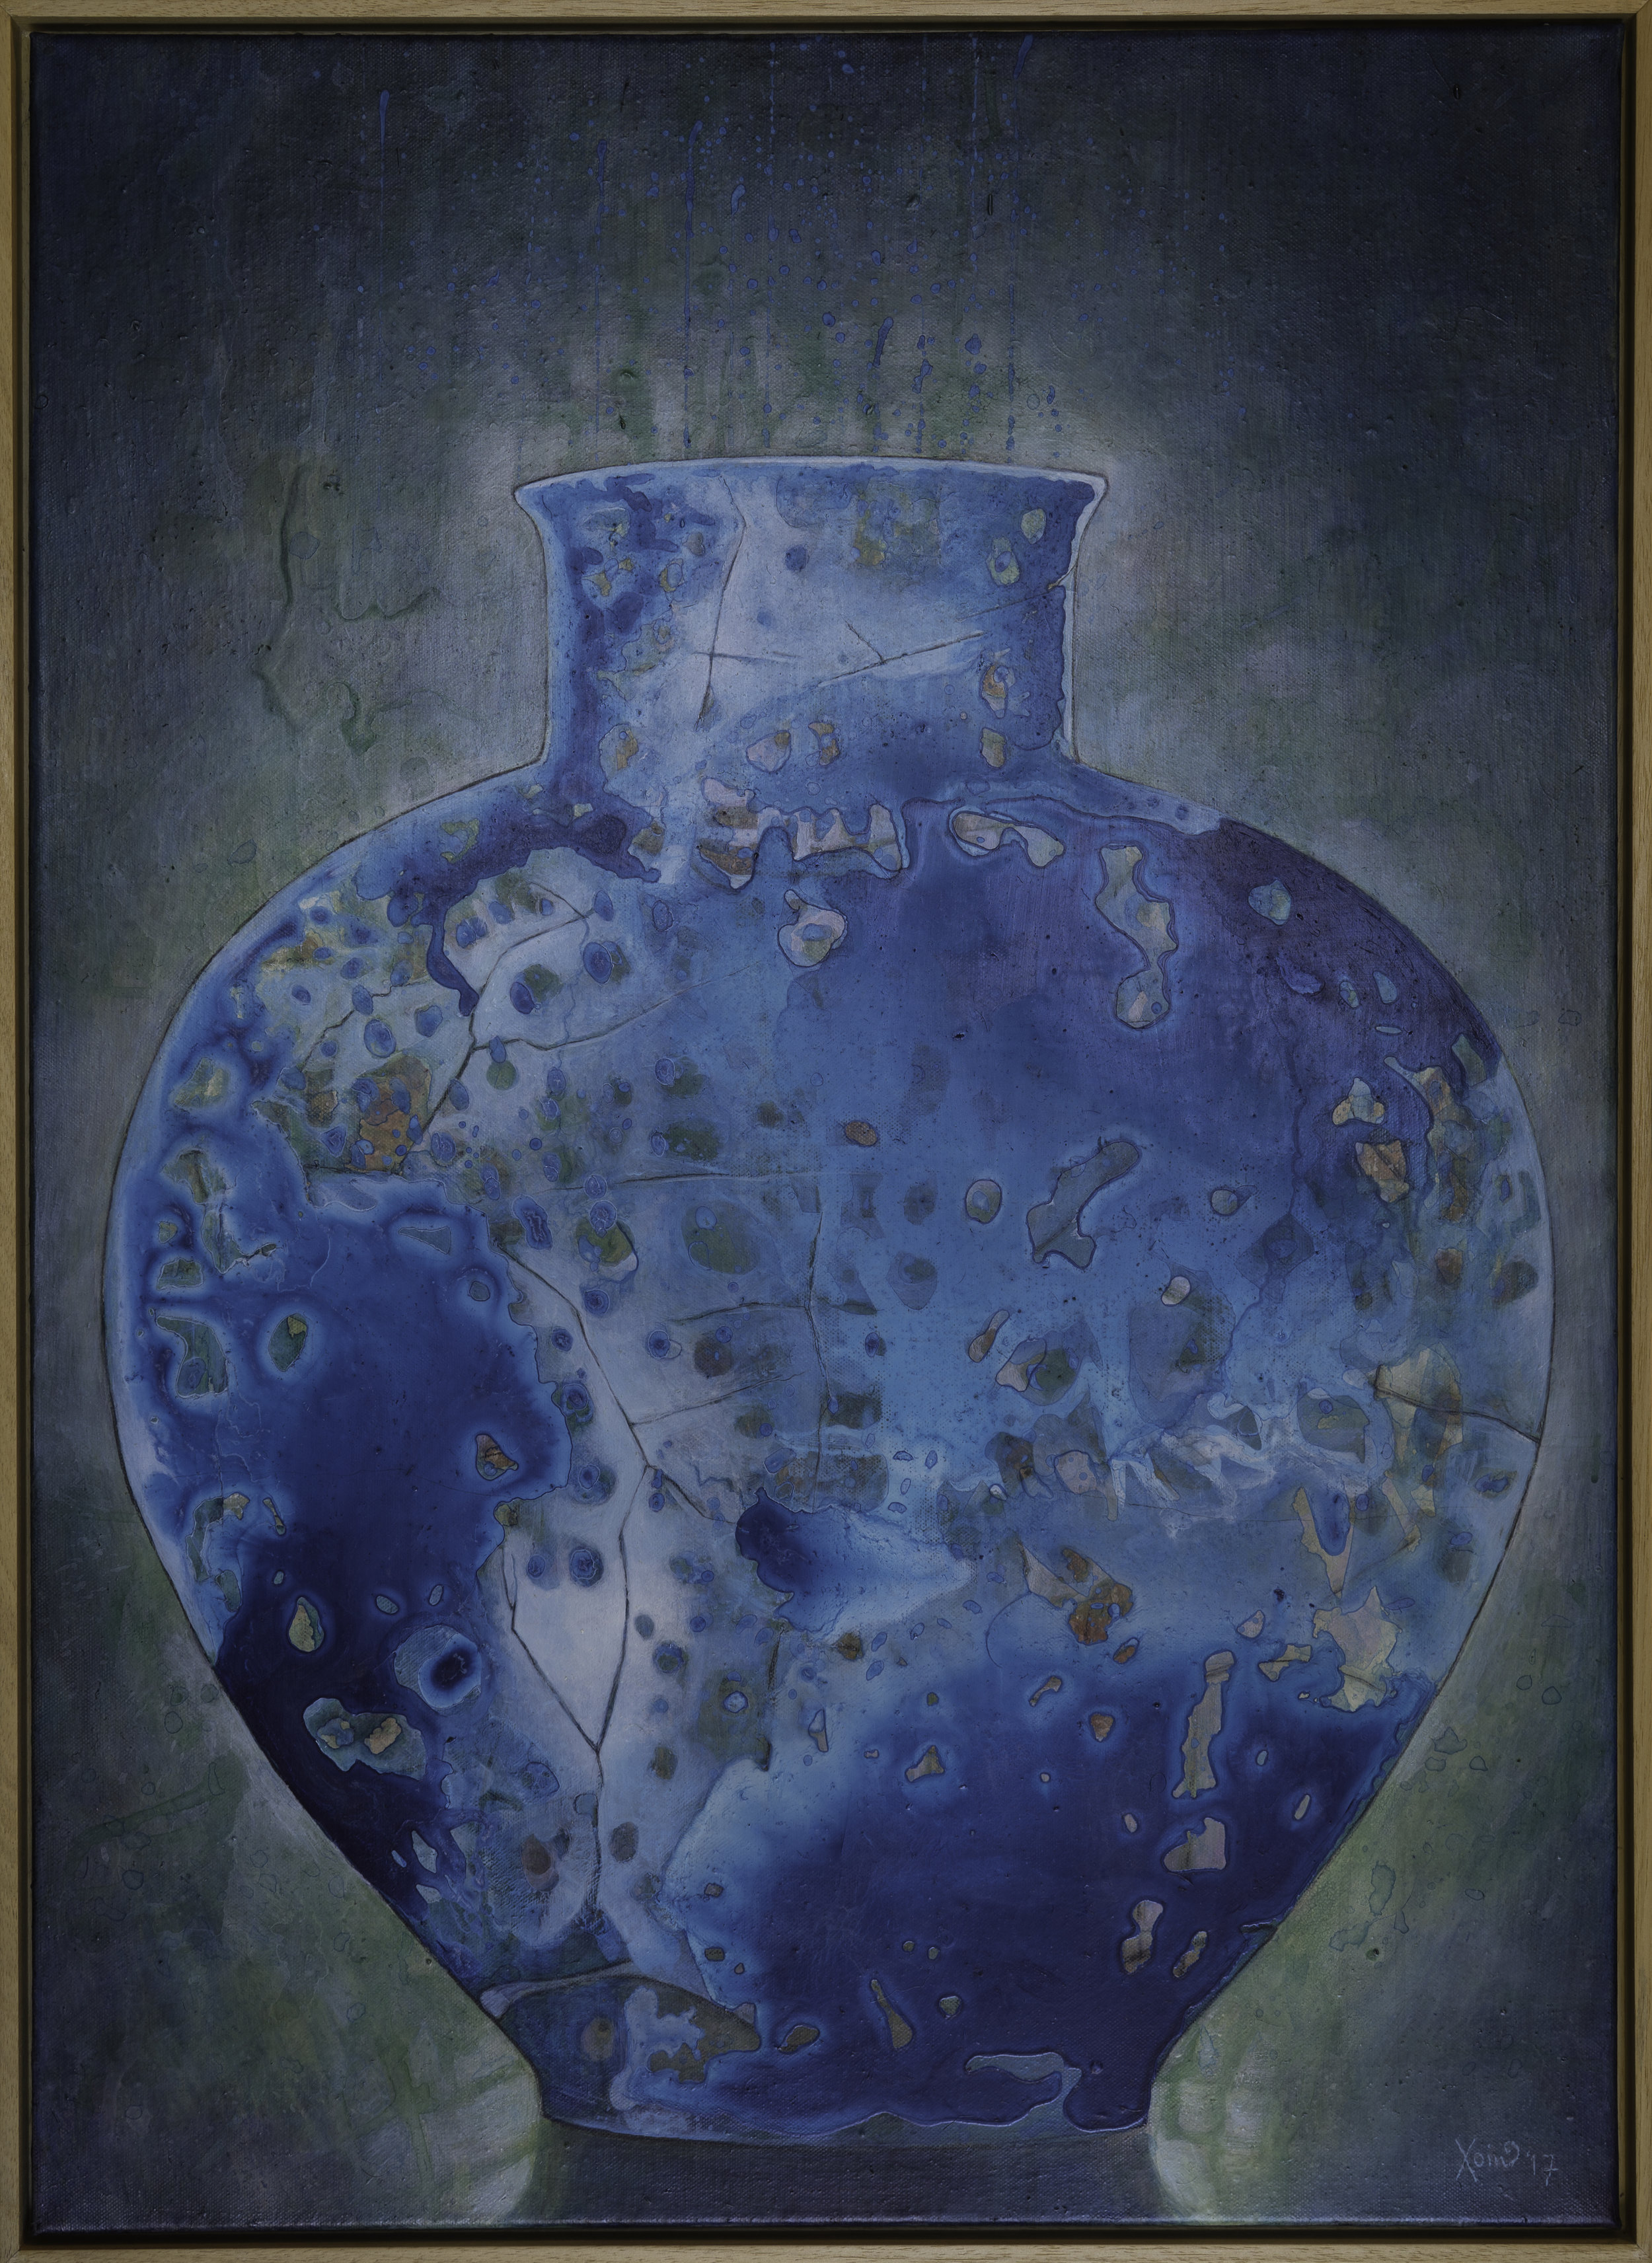 """Cracked Blue Vase"" 92.5cm x 67.5cm (Framed). Acrylic/Charcoal on Canvas. 2017"